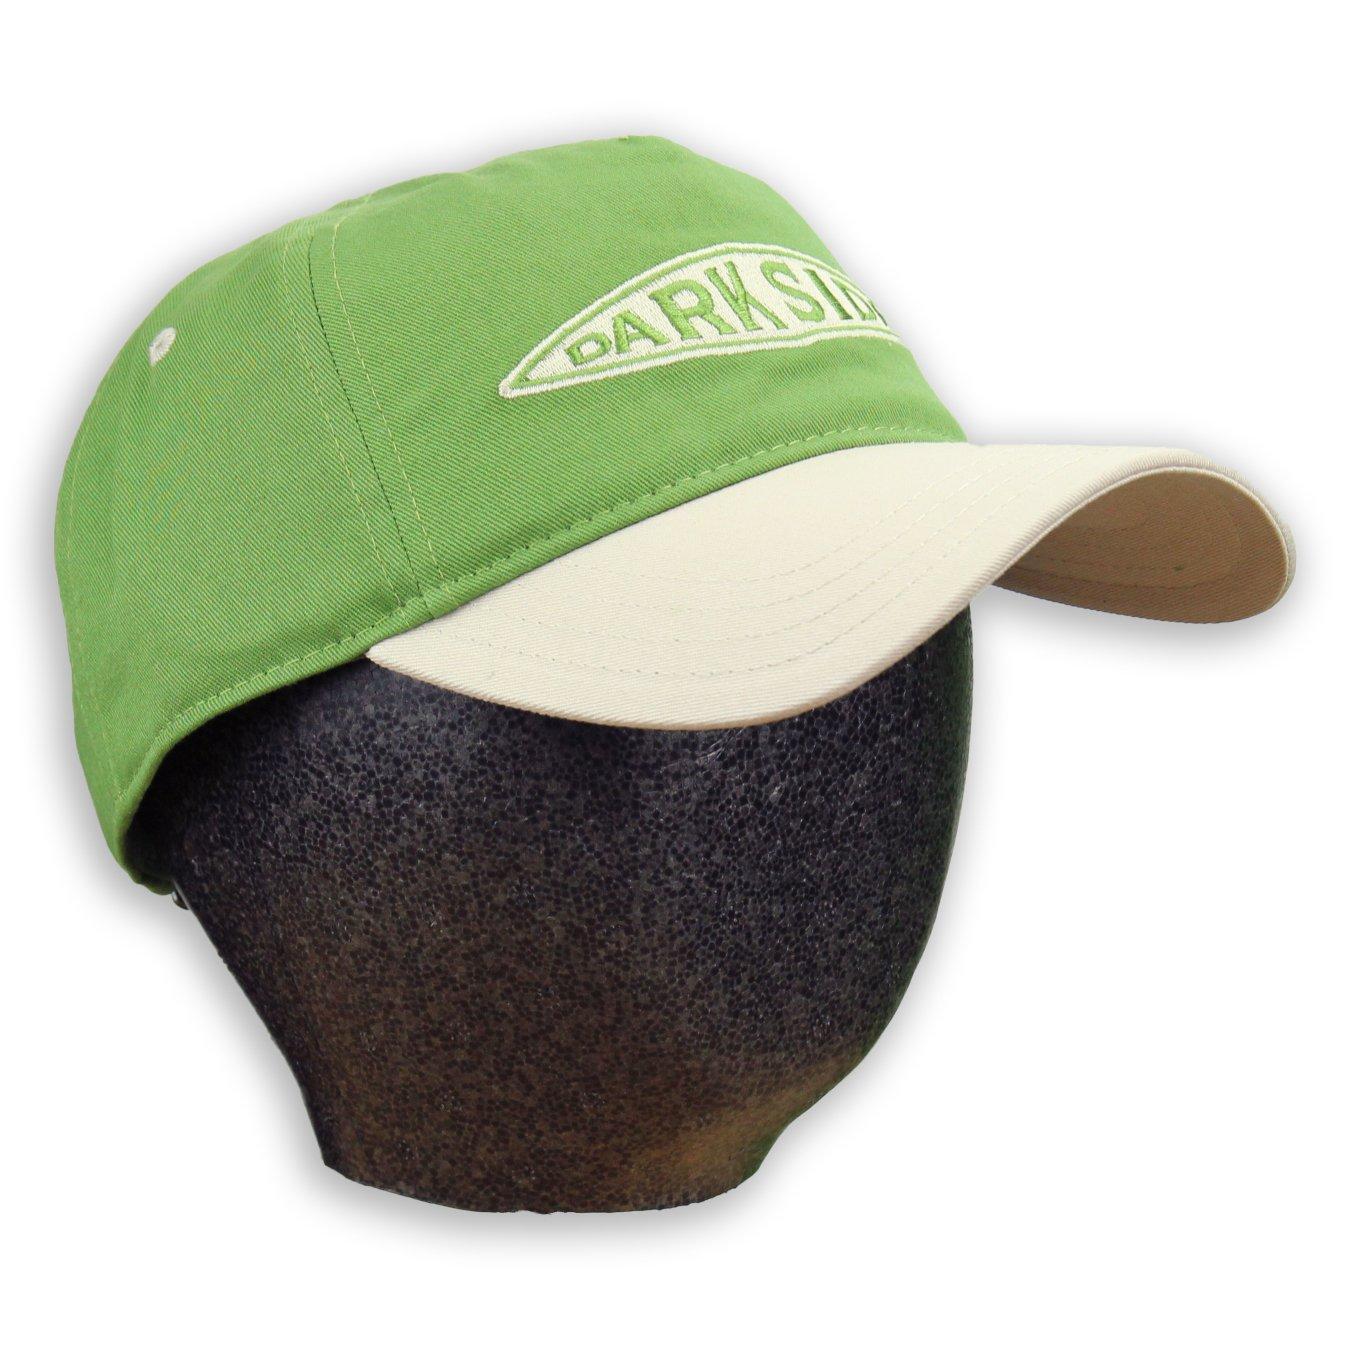 Darkside 90's Diamond Hat (Multiple Color Options)